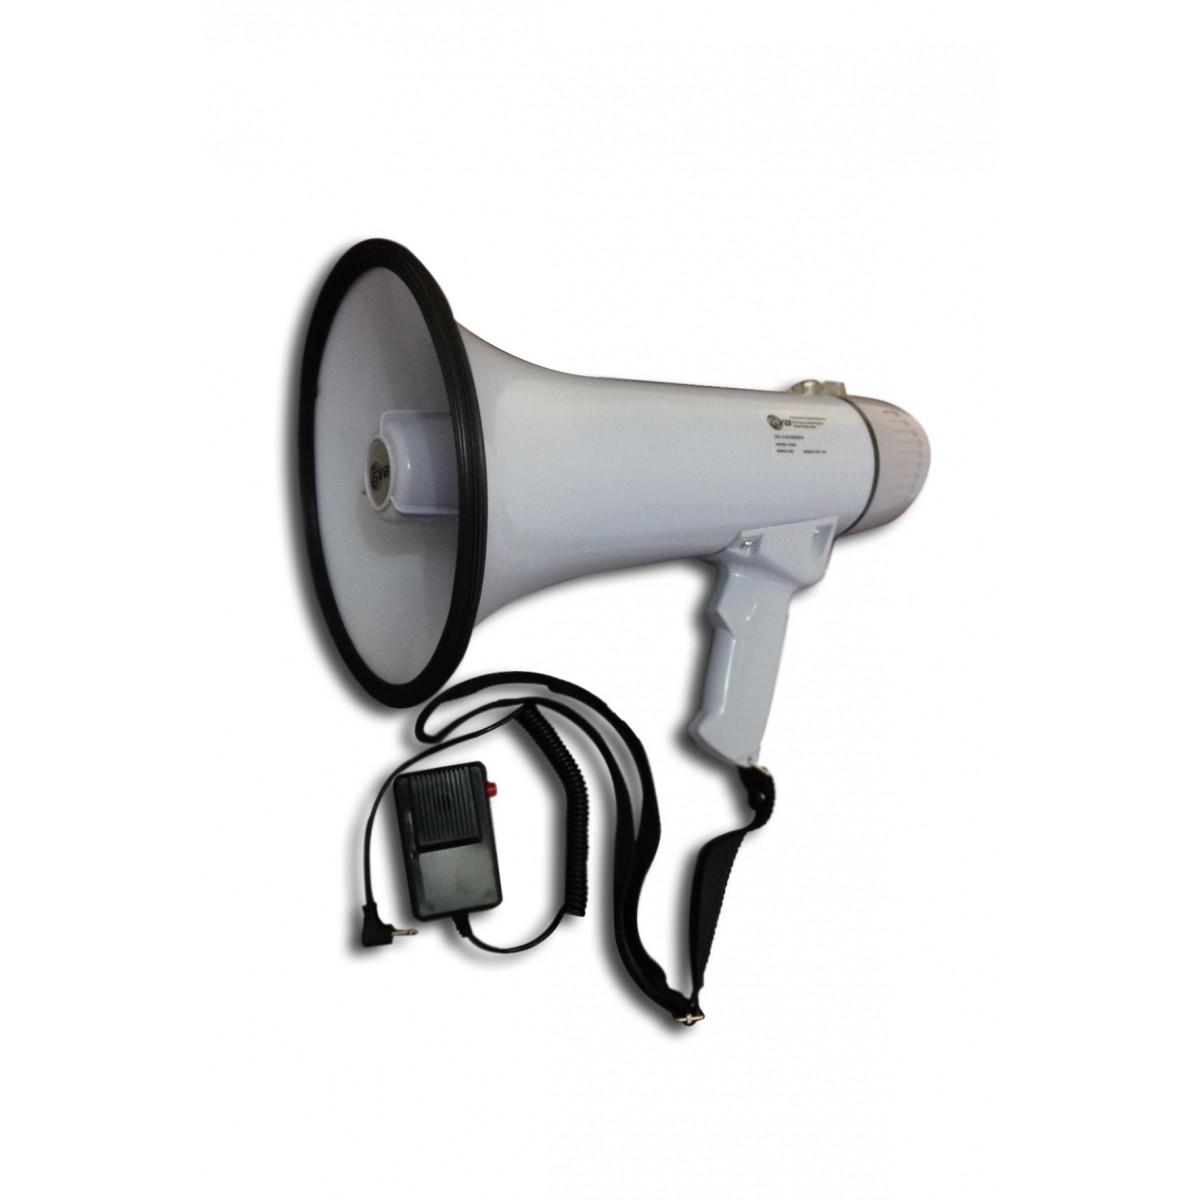 Megafone GVB-1503